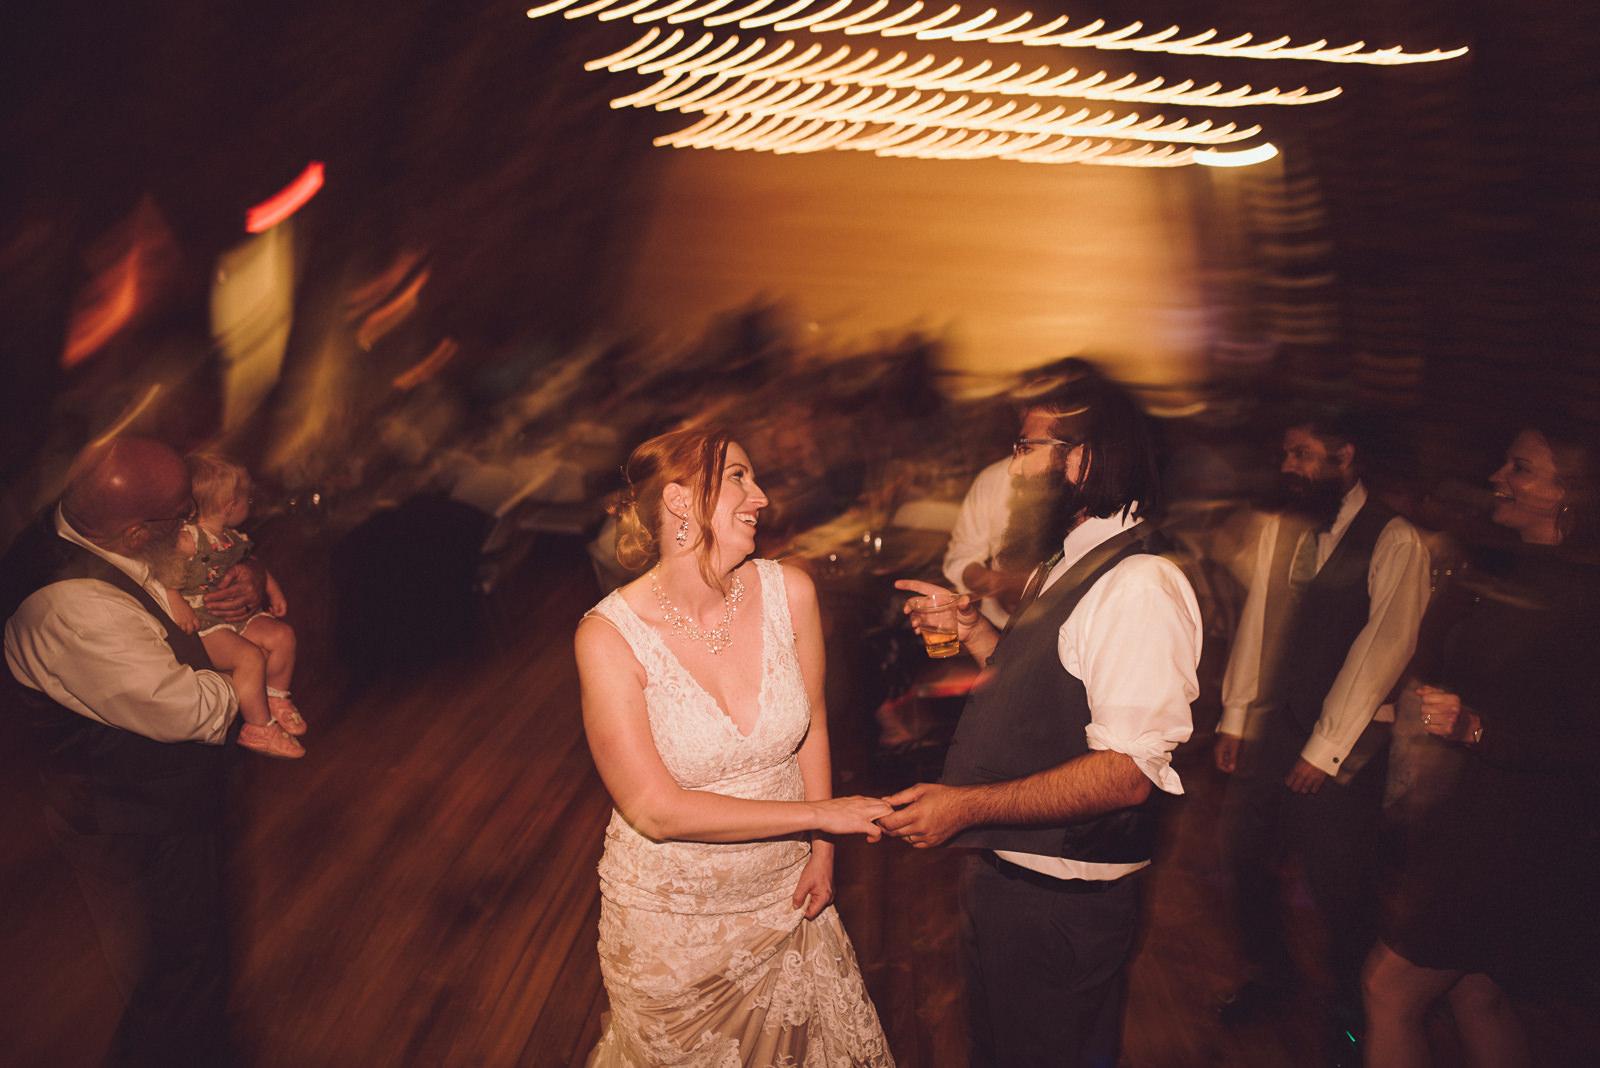 wedding-keely-caleb-2205-name-your-photo.jpg